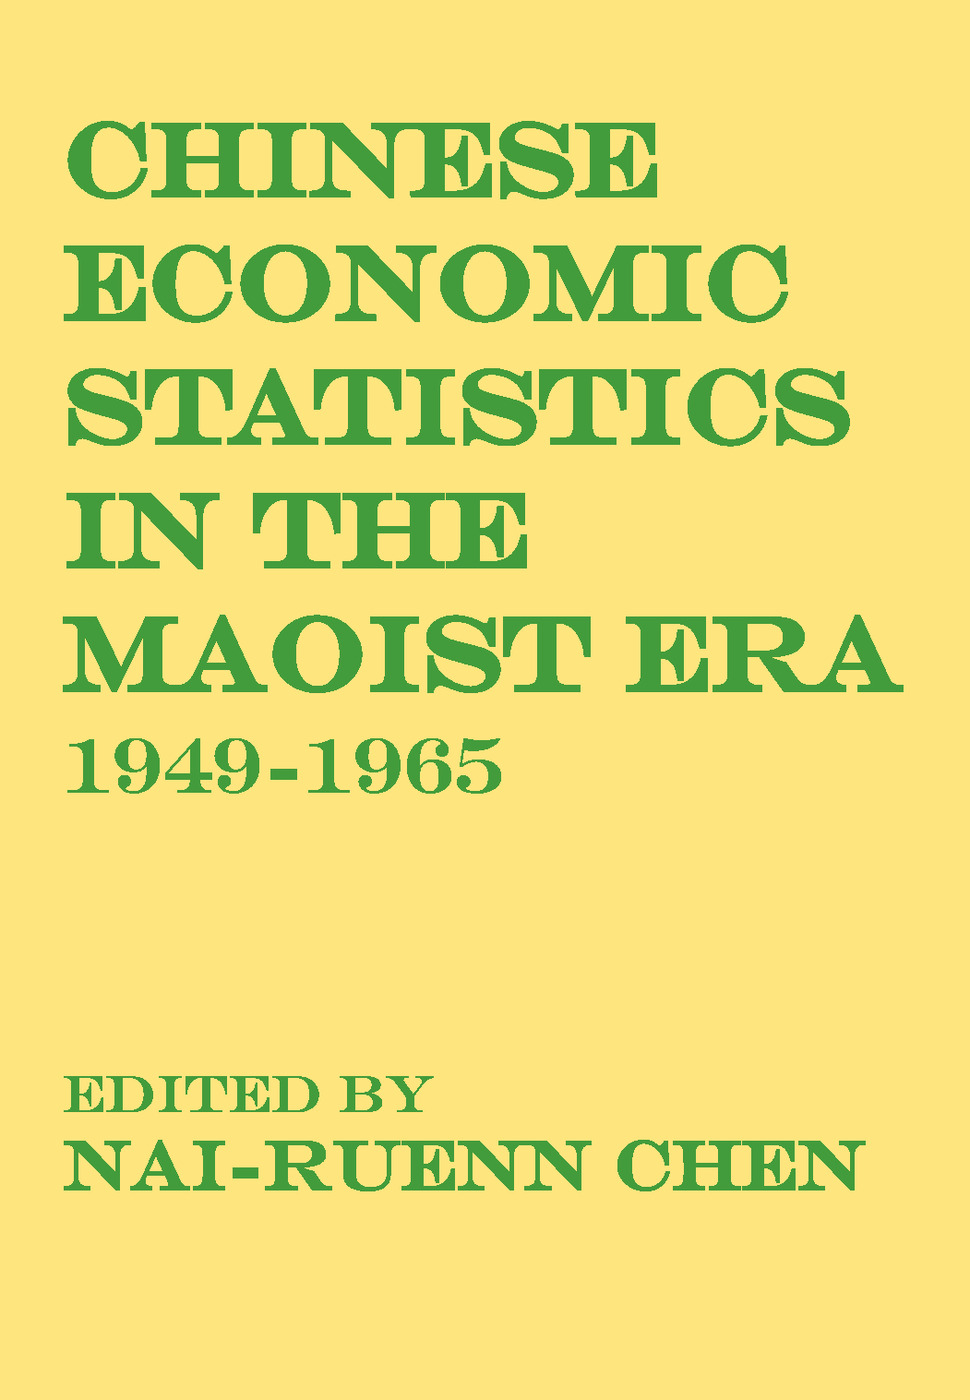 Chinese Economic Statistics in the Maoist Era